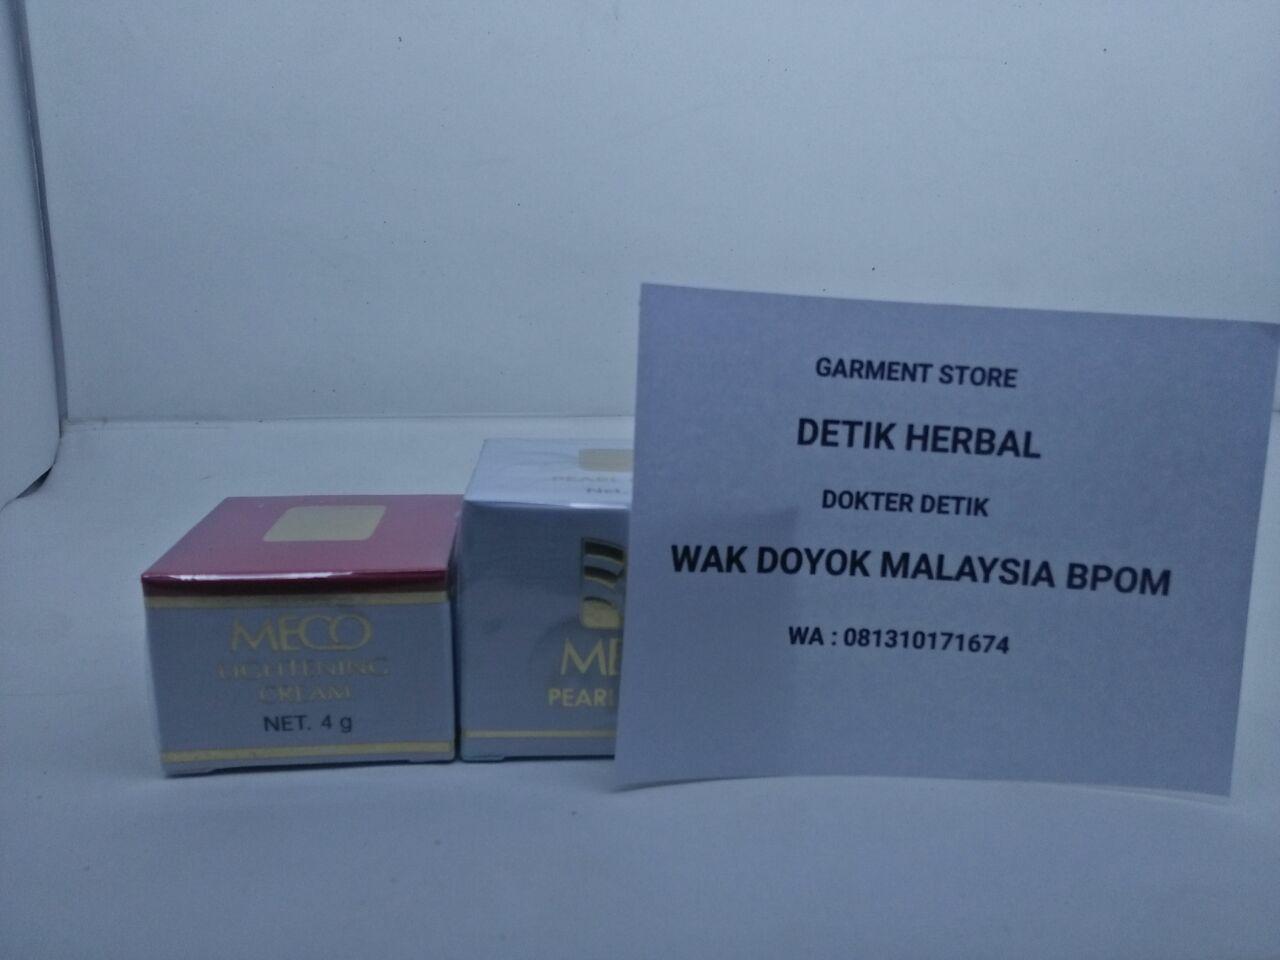 Jual Paket Cream Meco Siang Malam Wak Doyok Malaysia Bpom Krim Muka Lightening 4gr Tokopedia